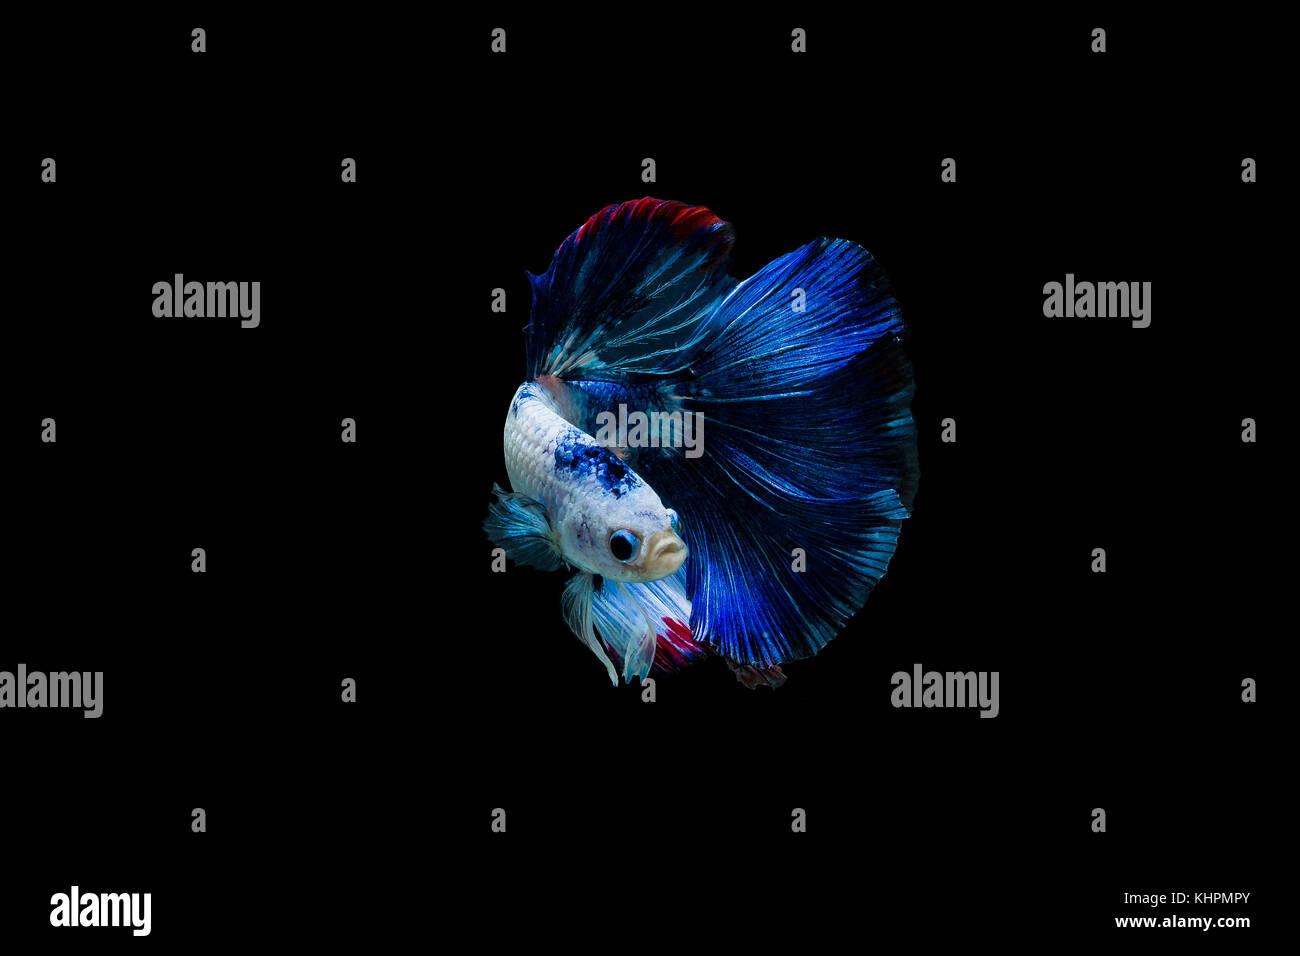 Betta splendens halfmoon,Colorful siamese fighting fish,Fighting fish on black background, - Stock Image